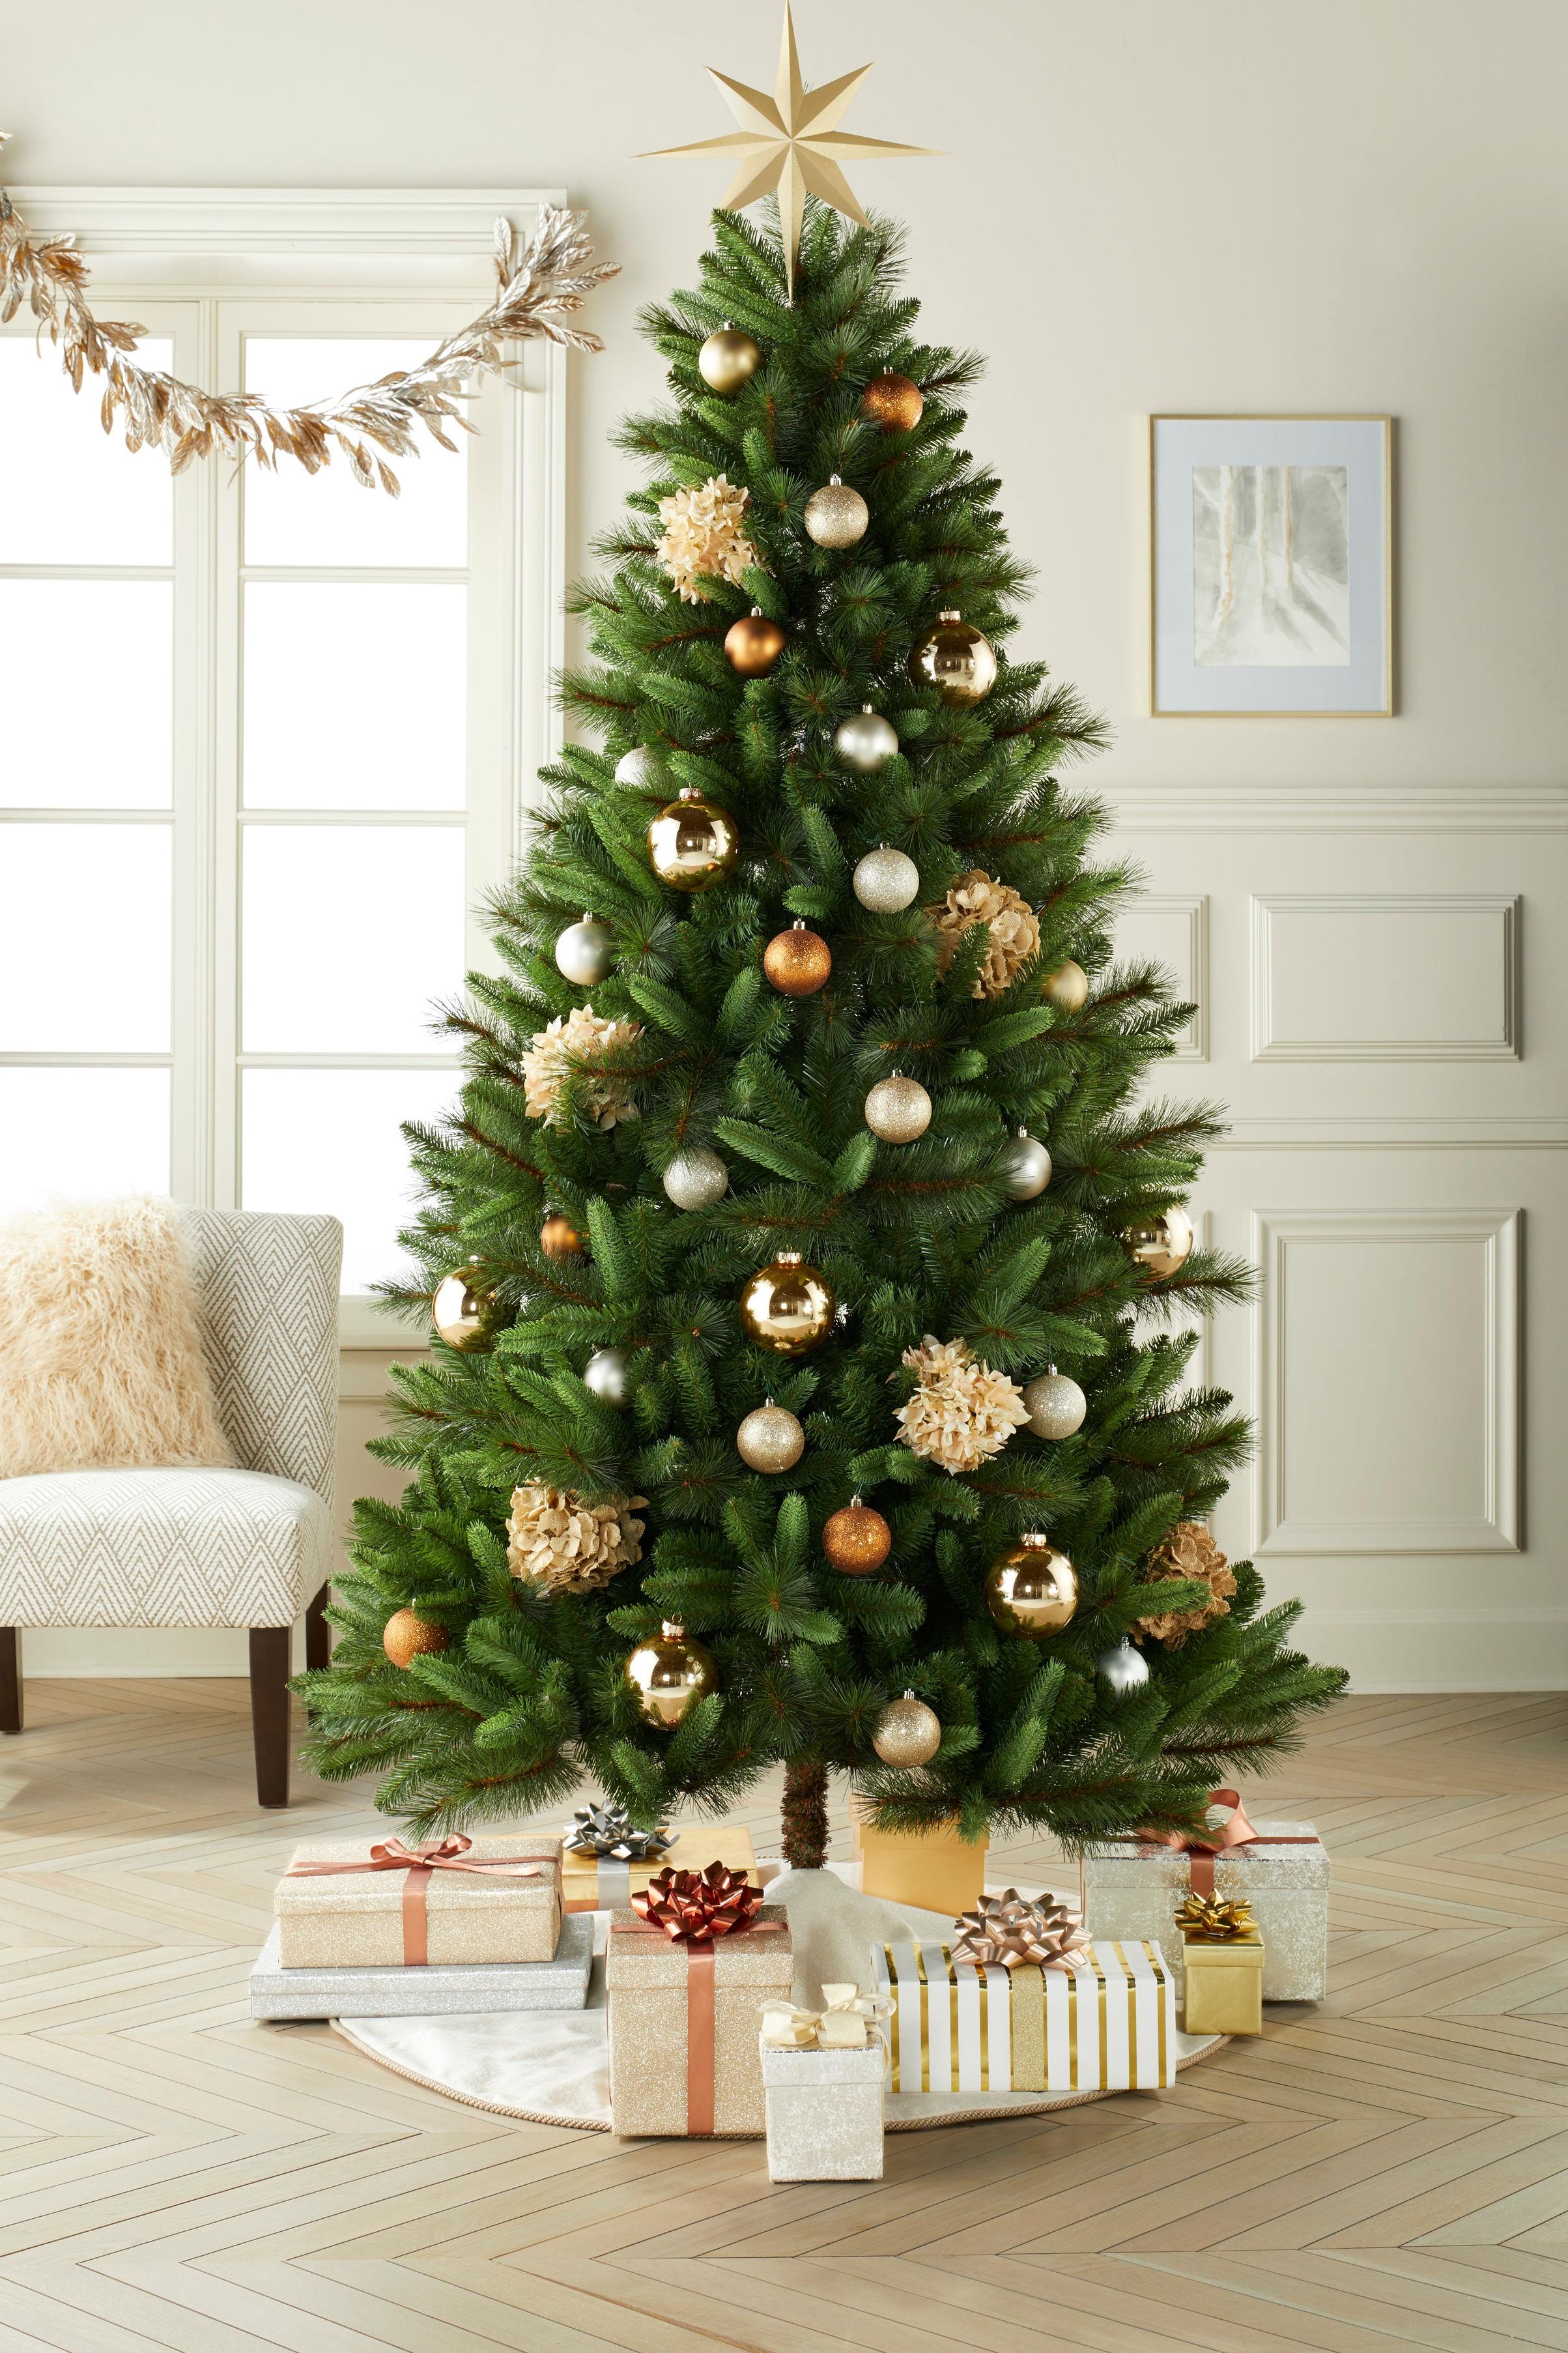 C-000696-01-043_051-01-2782_7' UNLIT Artificial Christmas Tree Balsam Fir - Wondershop.jpg